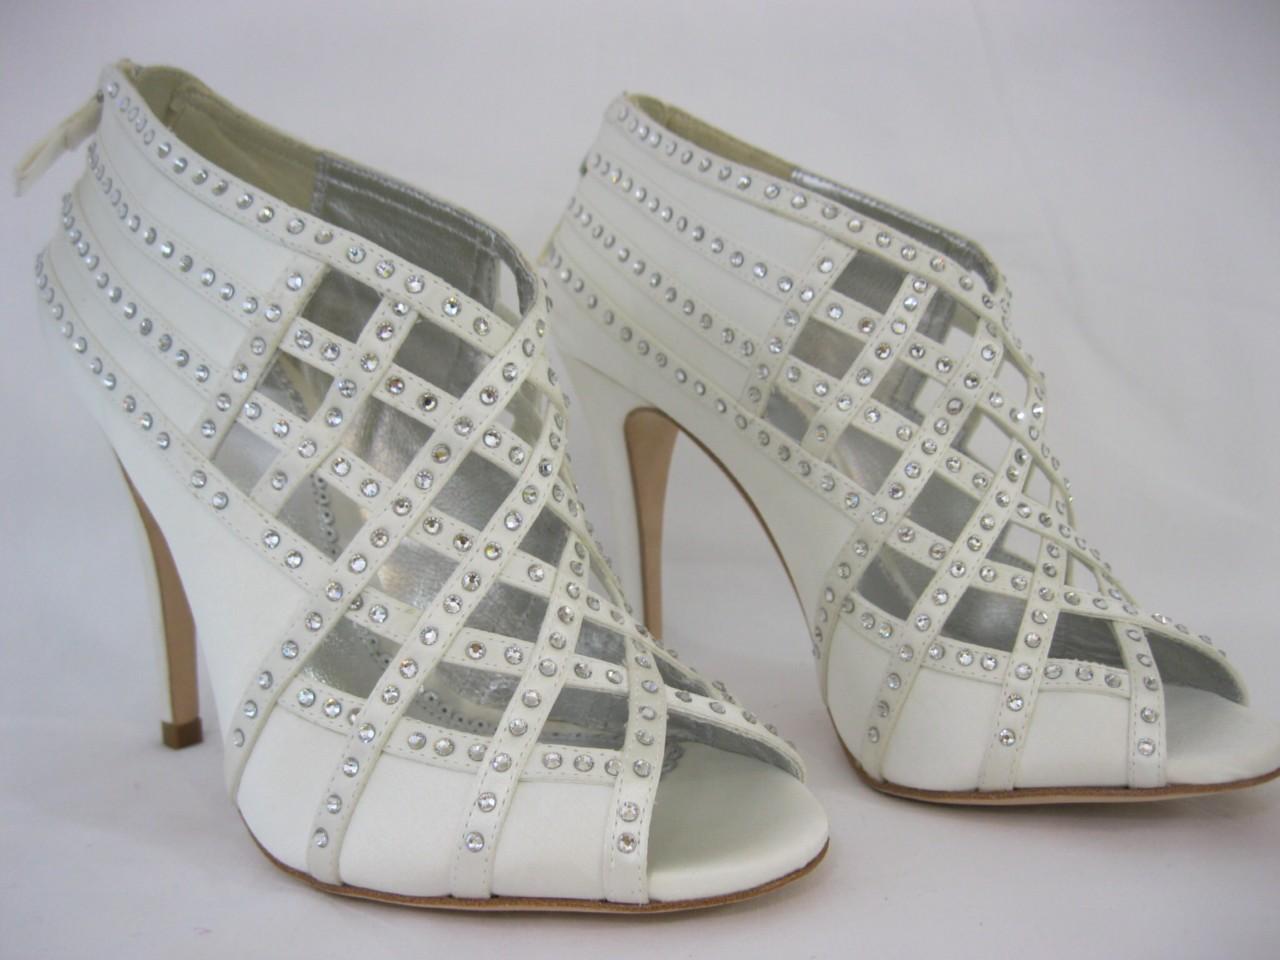 Bourne Tamsin Bridal Shoes 3 8 GBP151 Ivory Satin Diamante Crystal Lattice Wedding